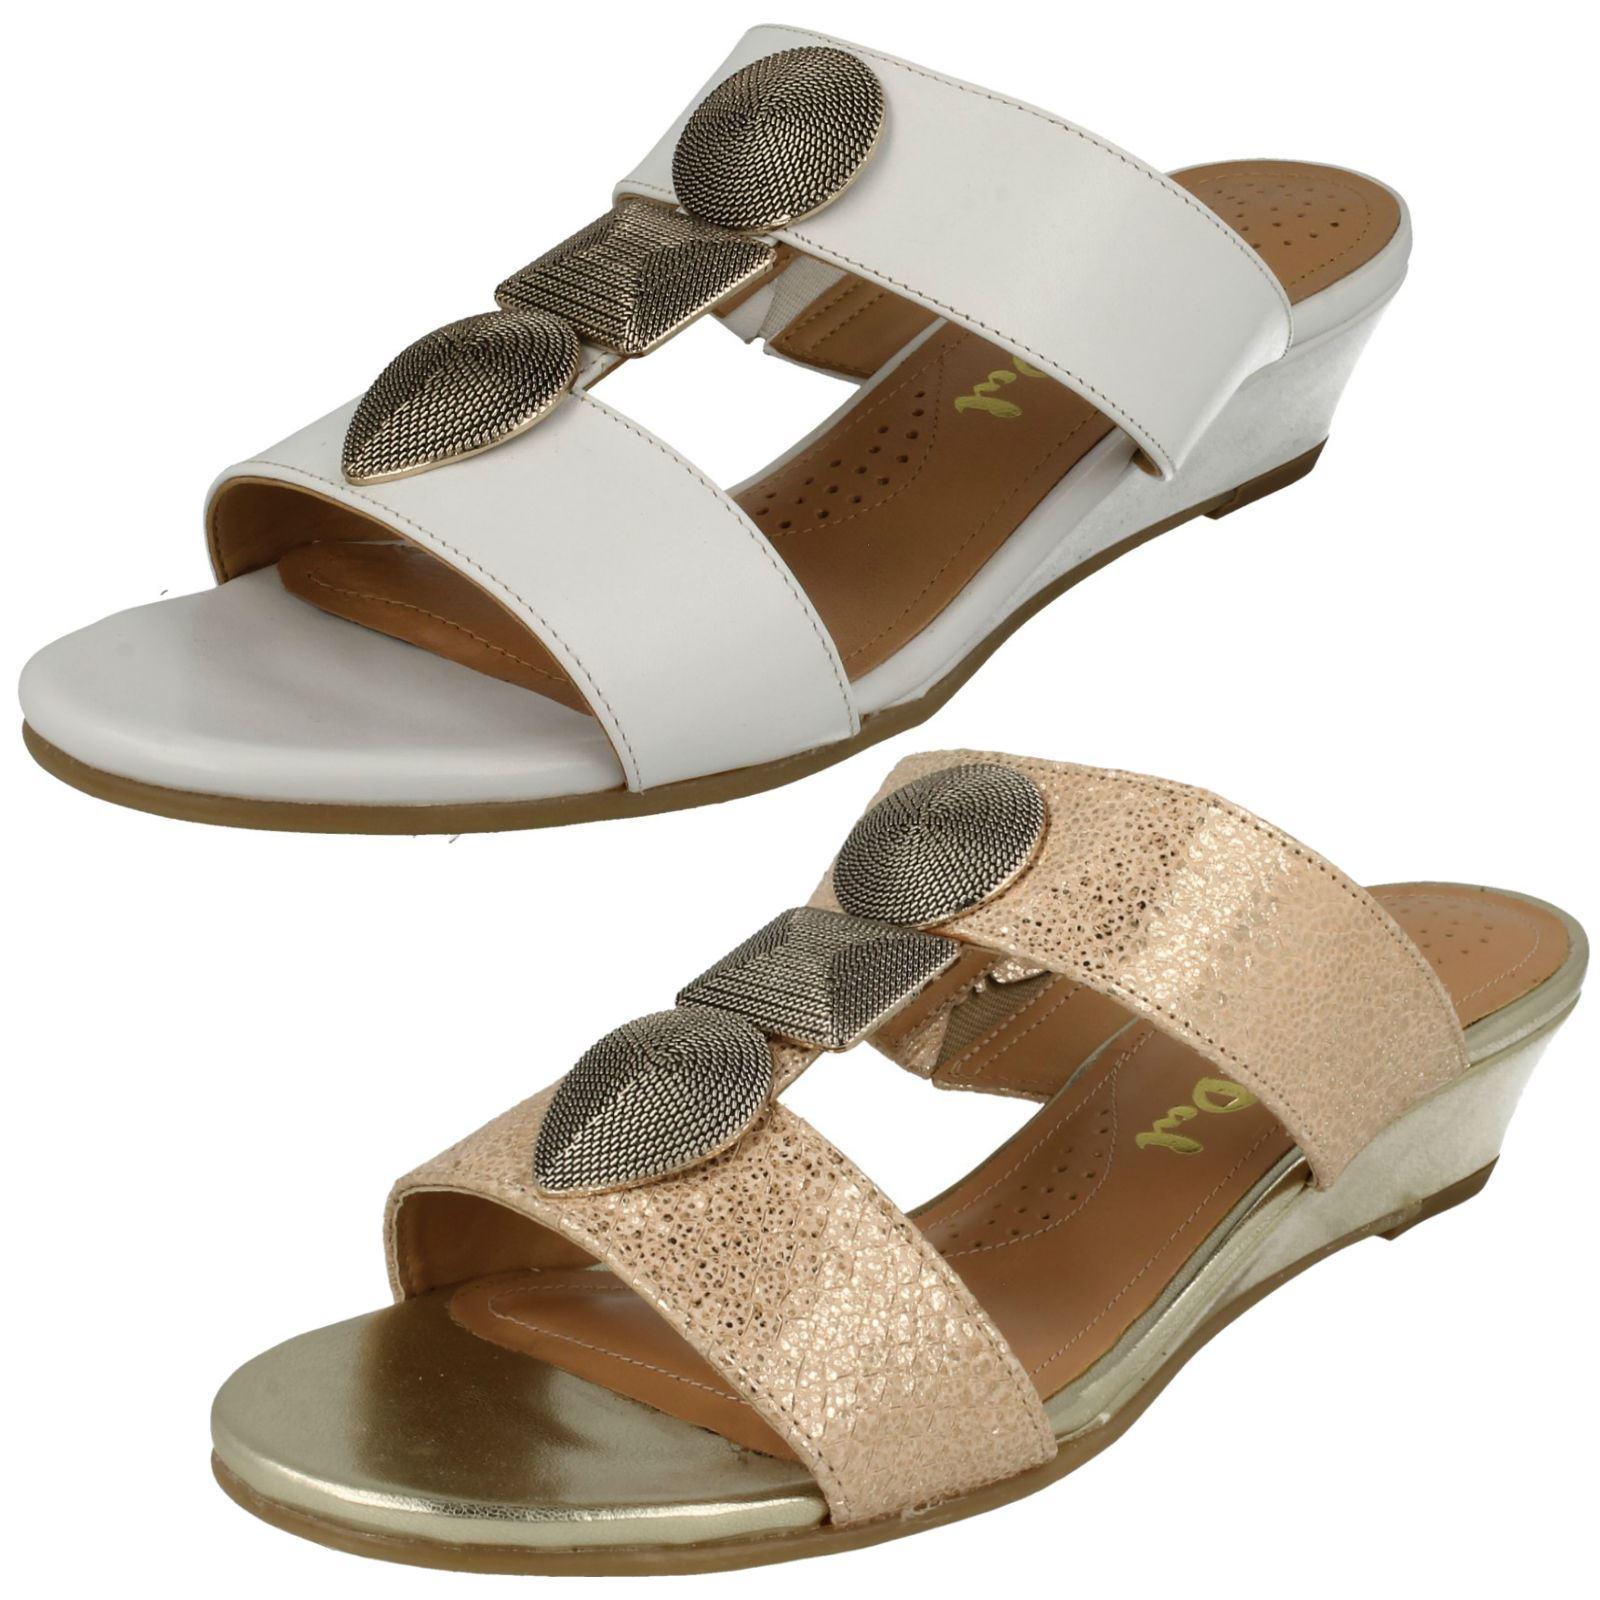 a5543ec022ef2 Details about Ladies Van Dal Summer Low Wedge Sandals 'Epsom'